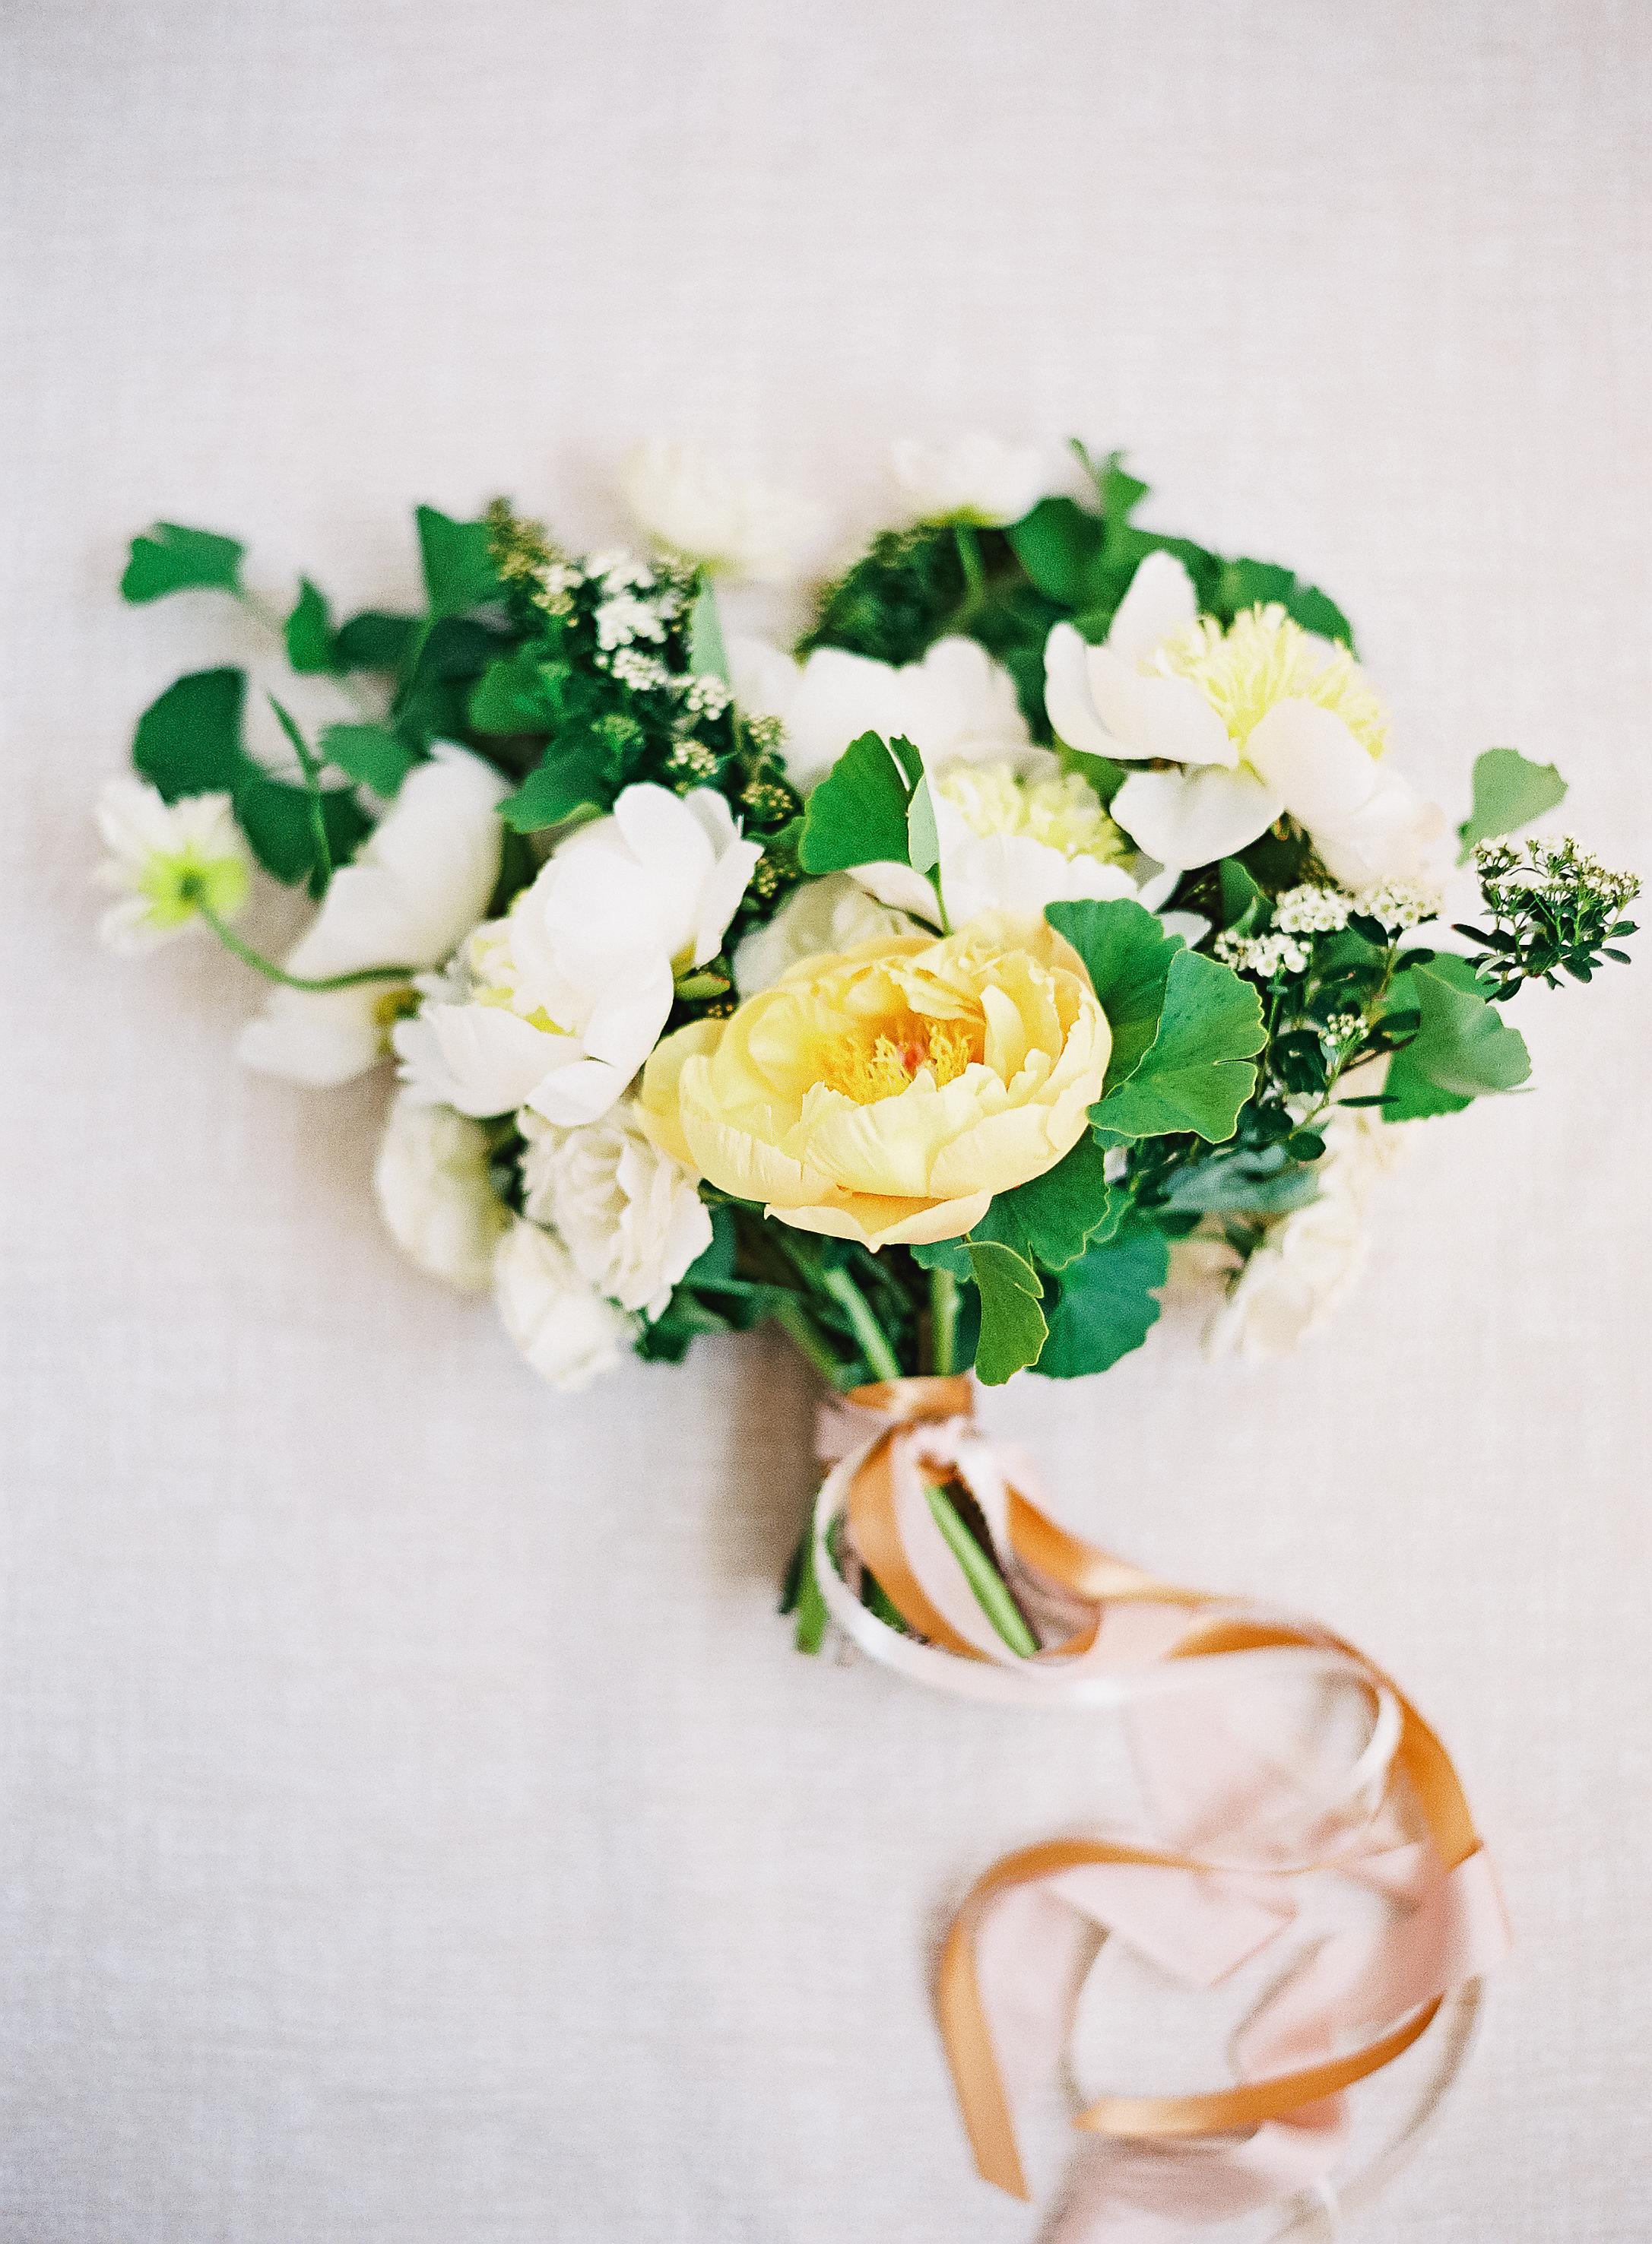 Michele_Beckwith_HP_Flowers_030.JPG